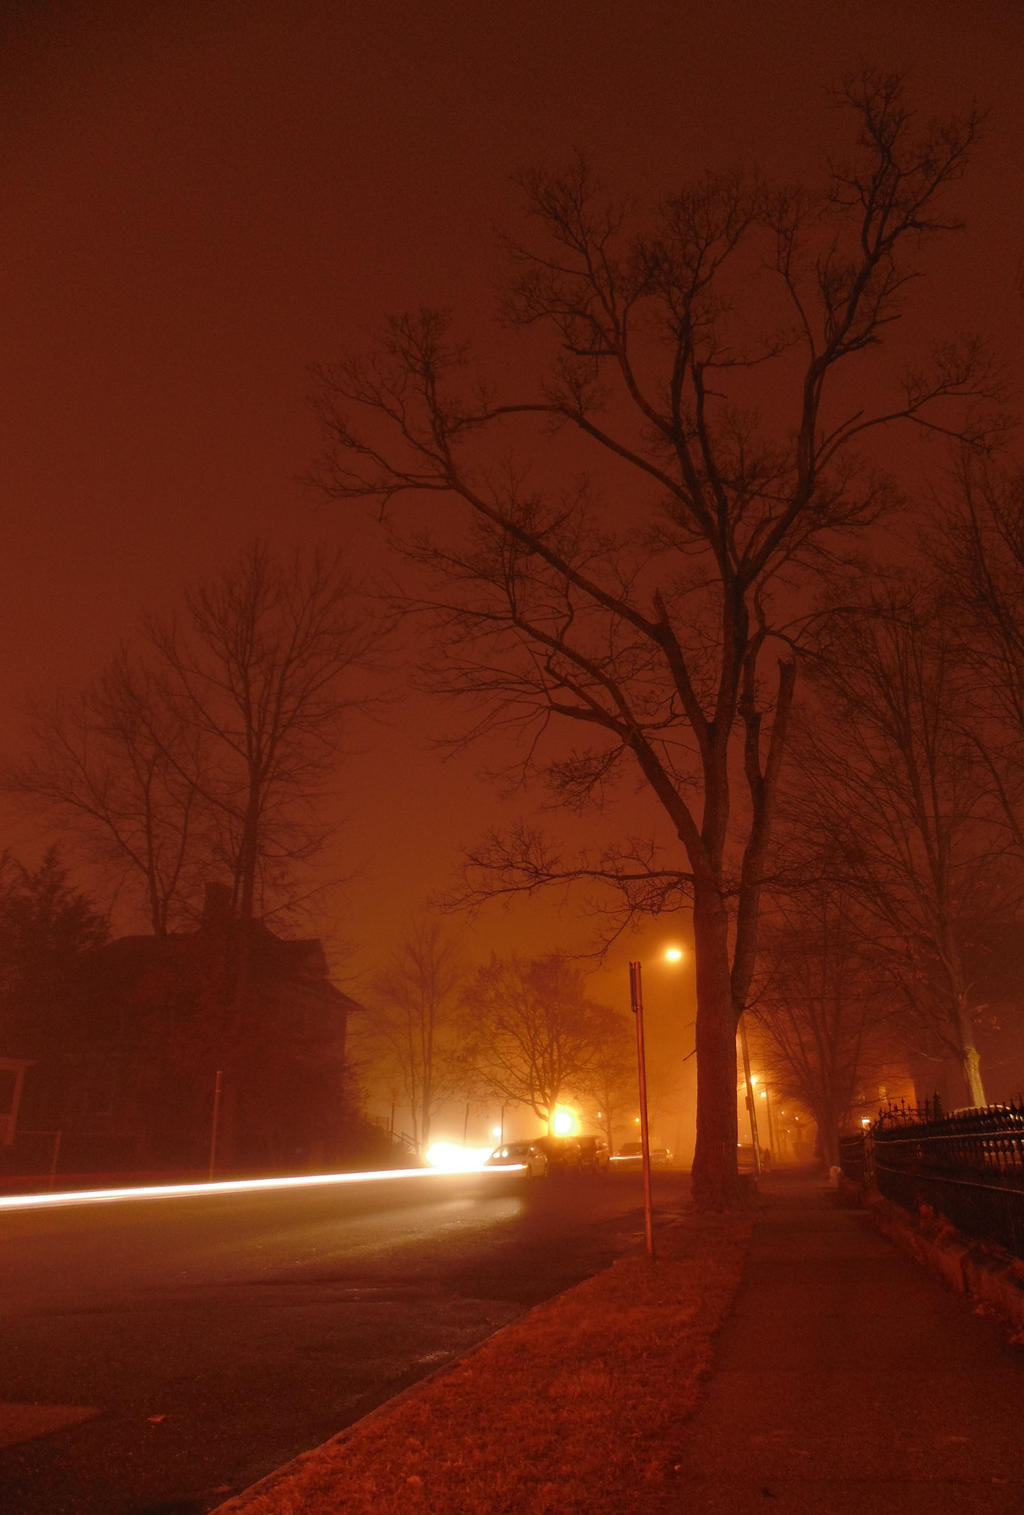 Foggy night - Electric lights by Lunarsight